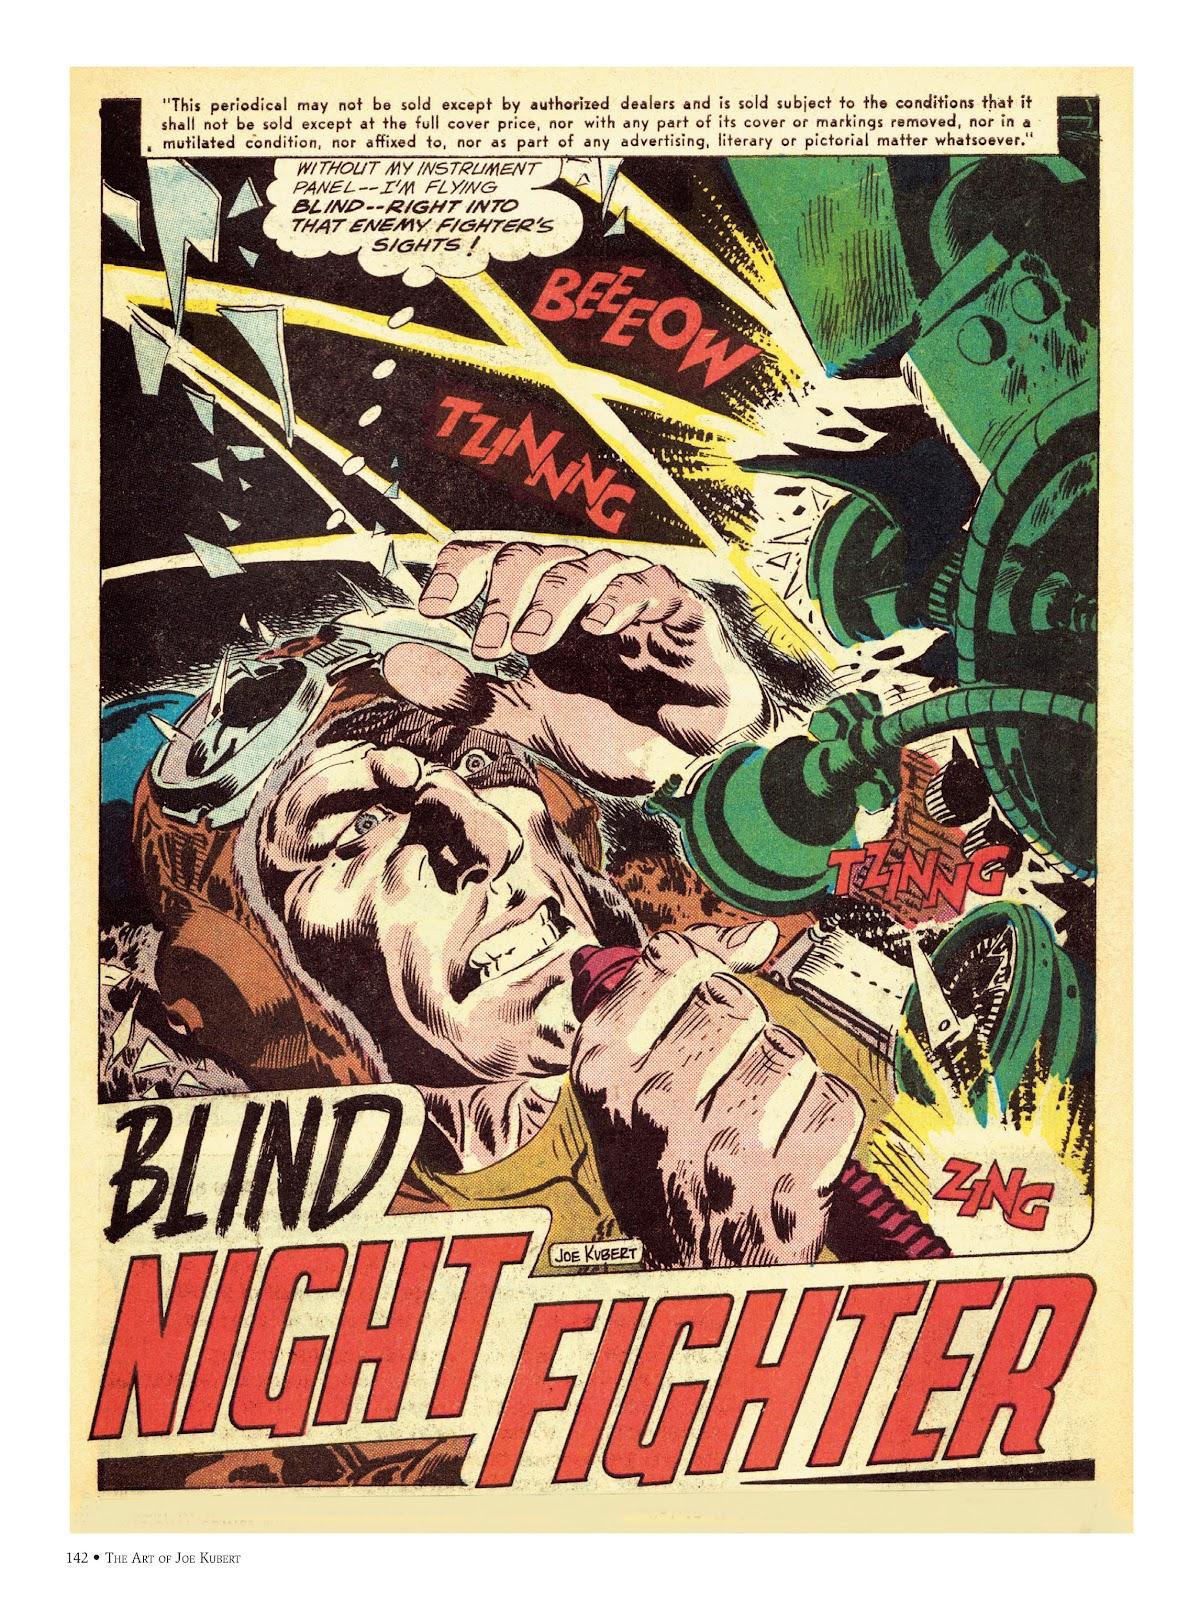 Read online The Art of Joe Kubert comic -  Issue # TPB (Part 2) - 42